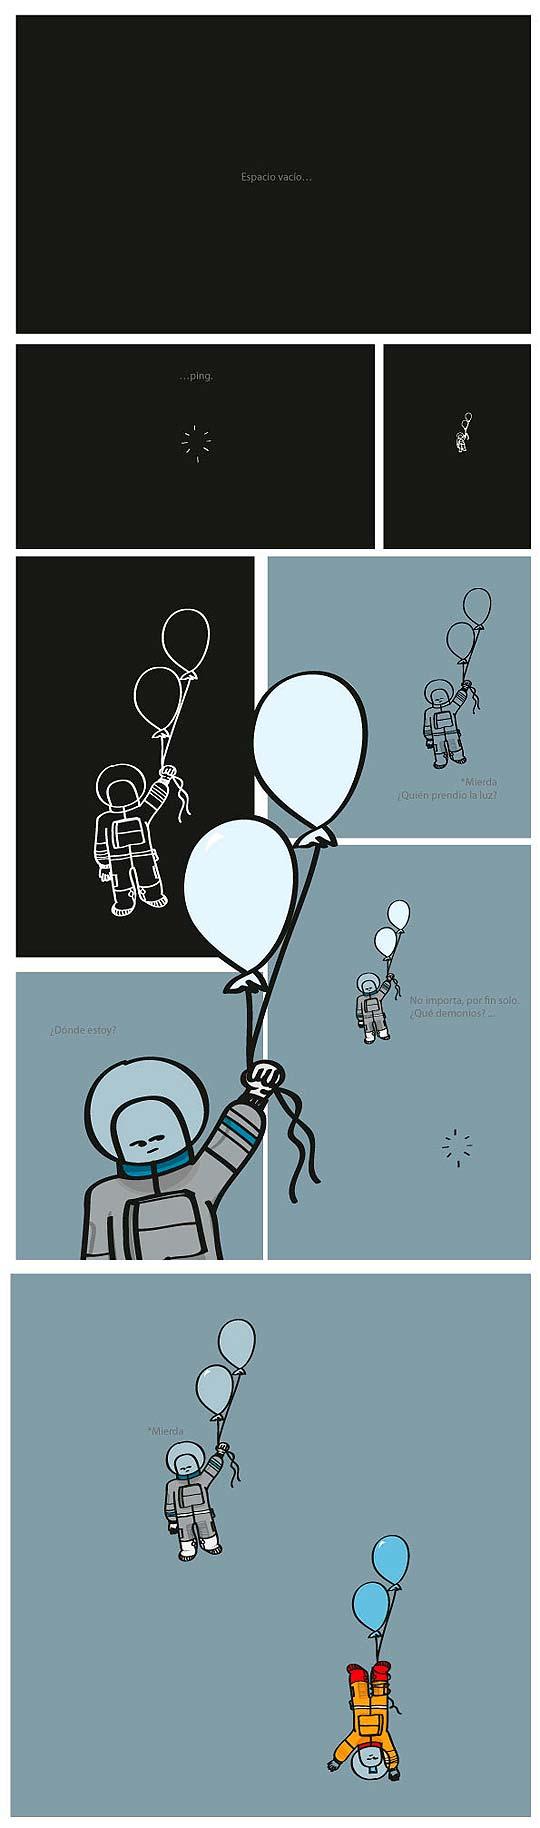 Ilustración de ANGÉLICA PARRA Aka GoD